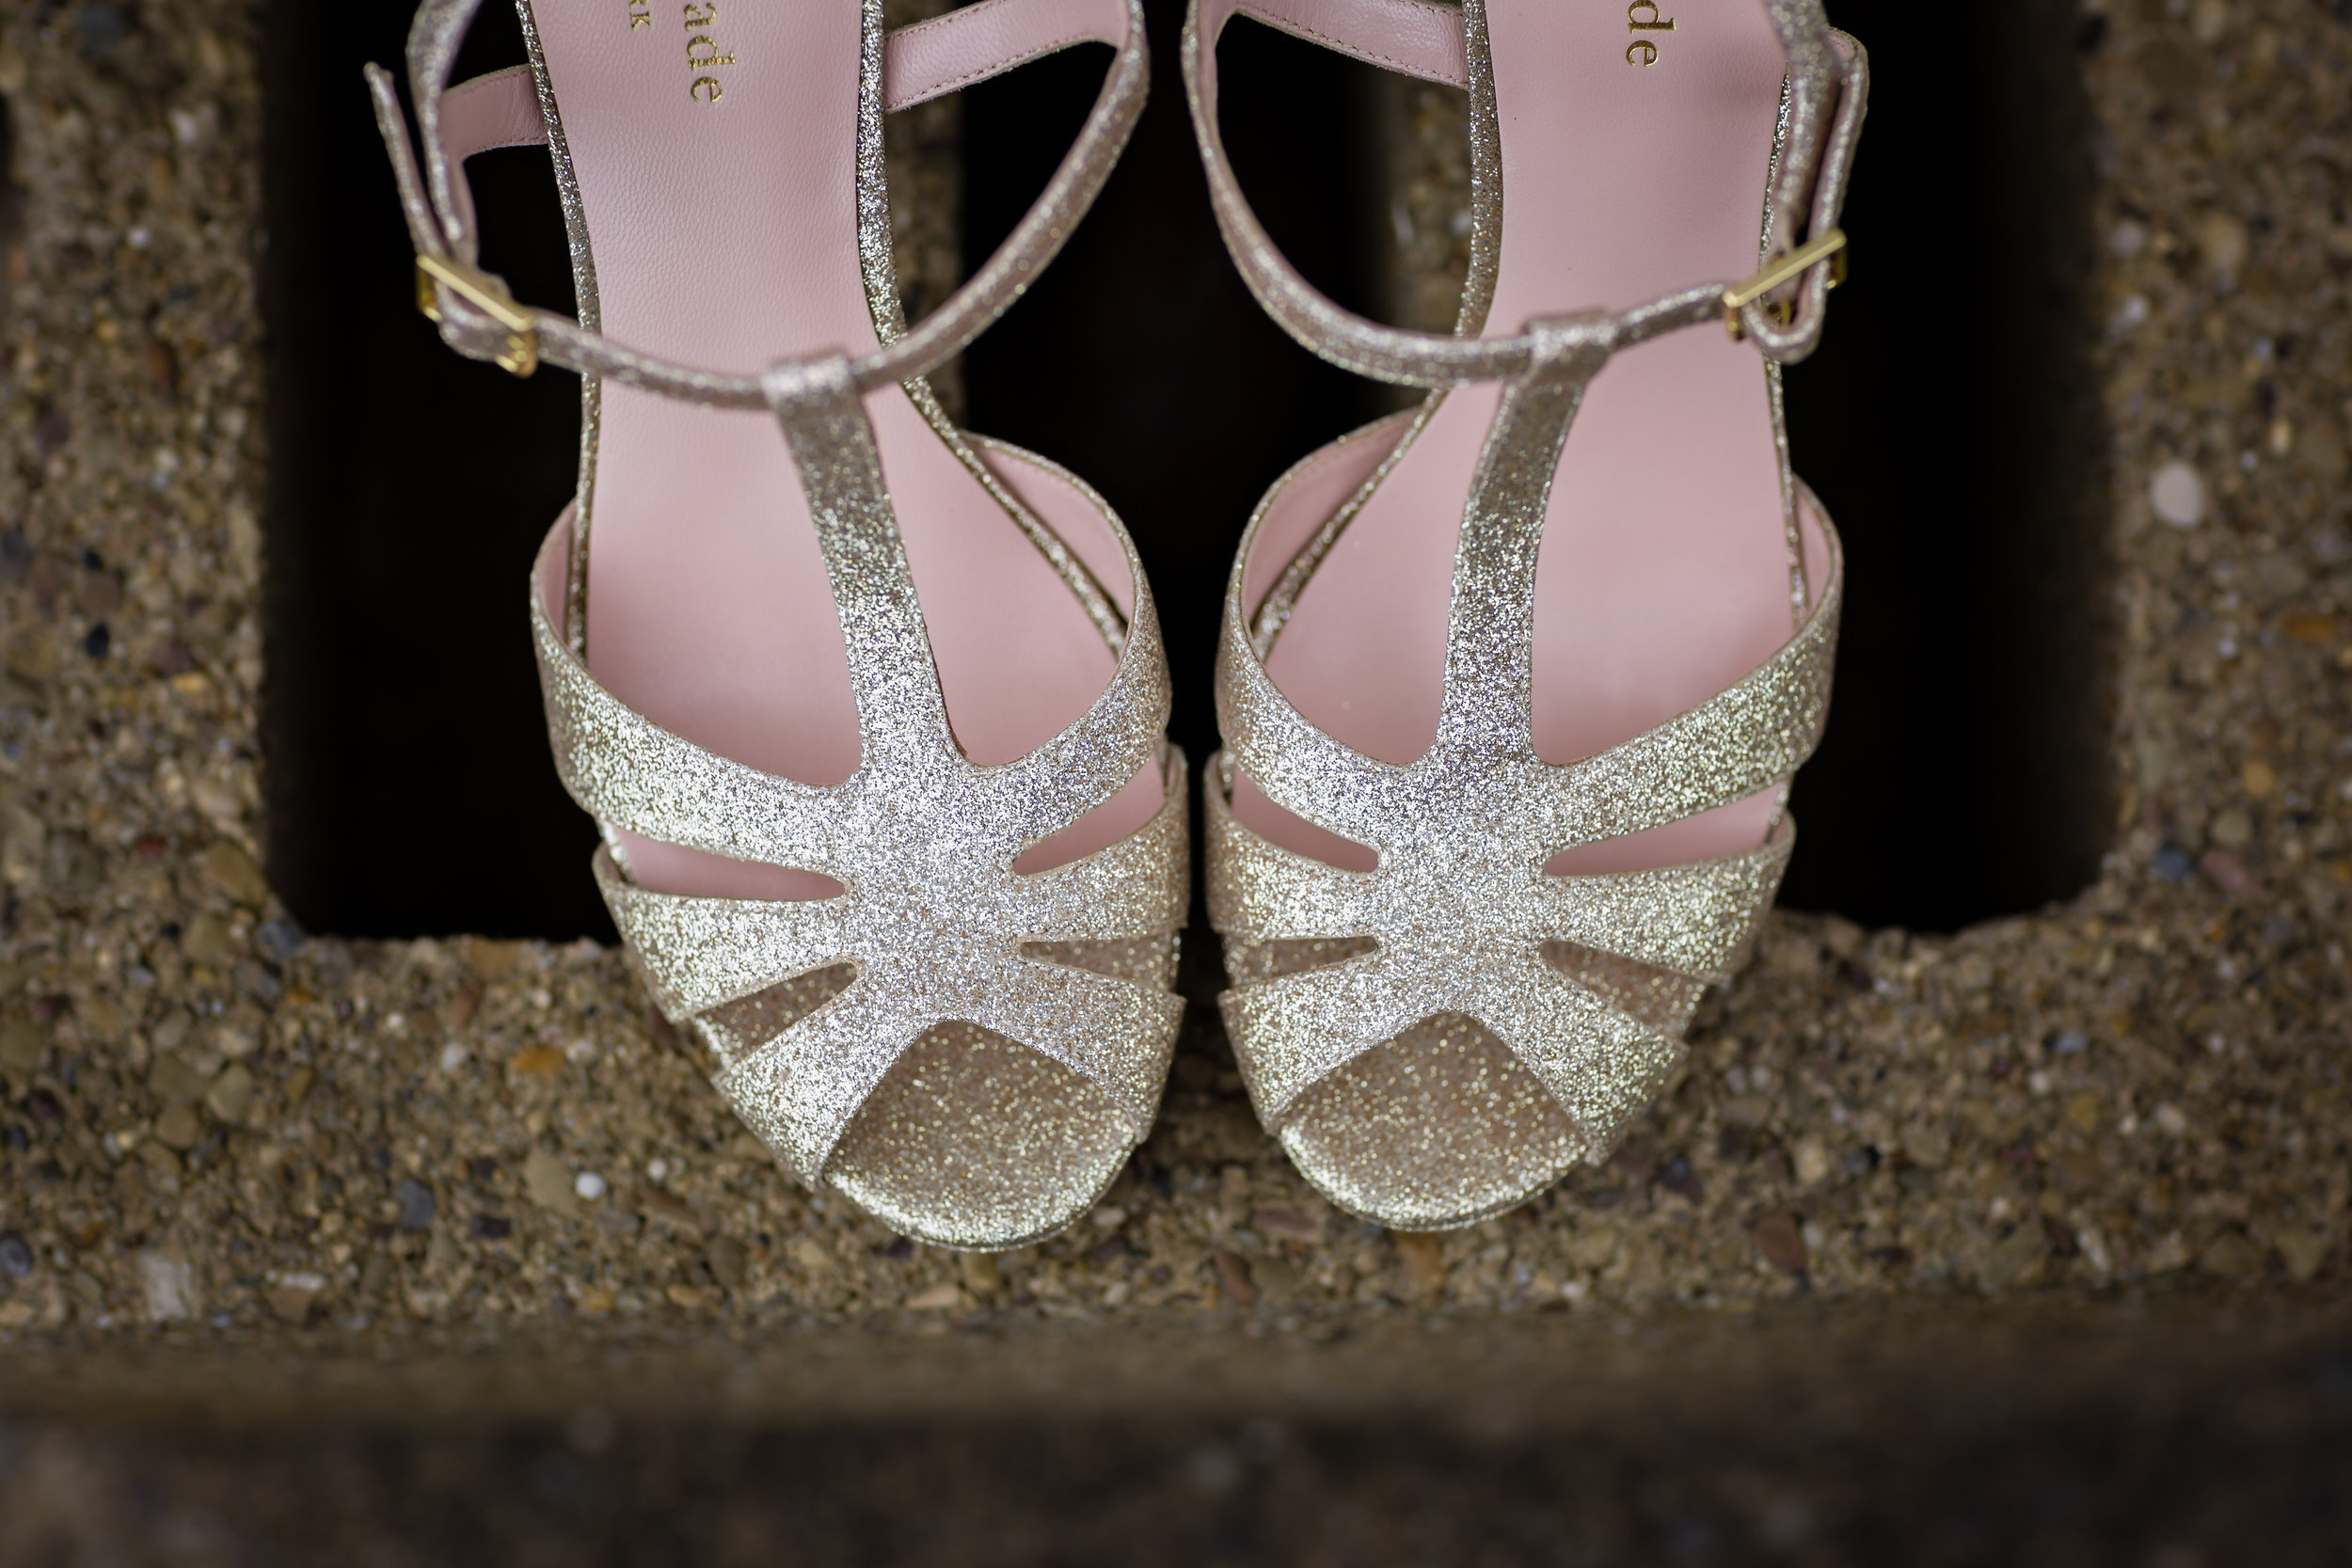 Gold Wedding Shoes - Pittsburgh Wedding Venue - Duquesne University Wedding